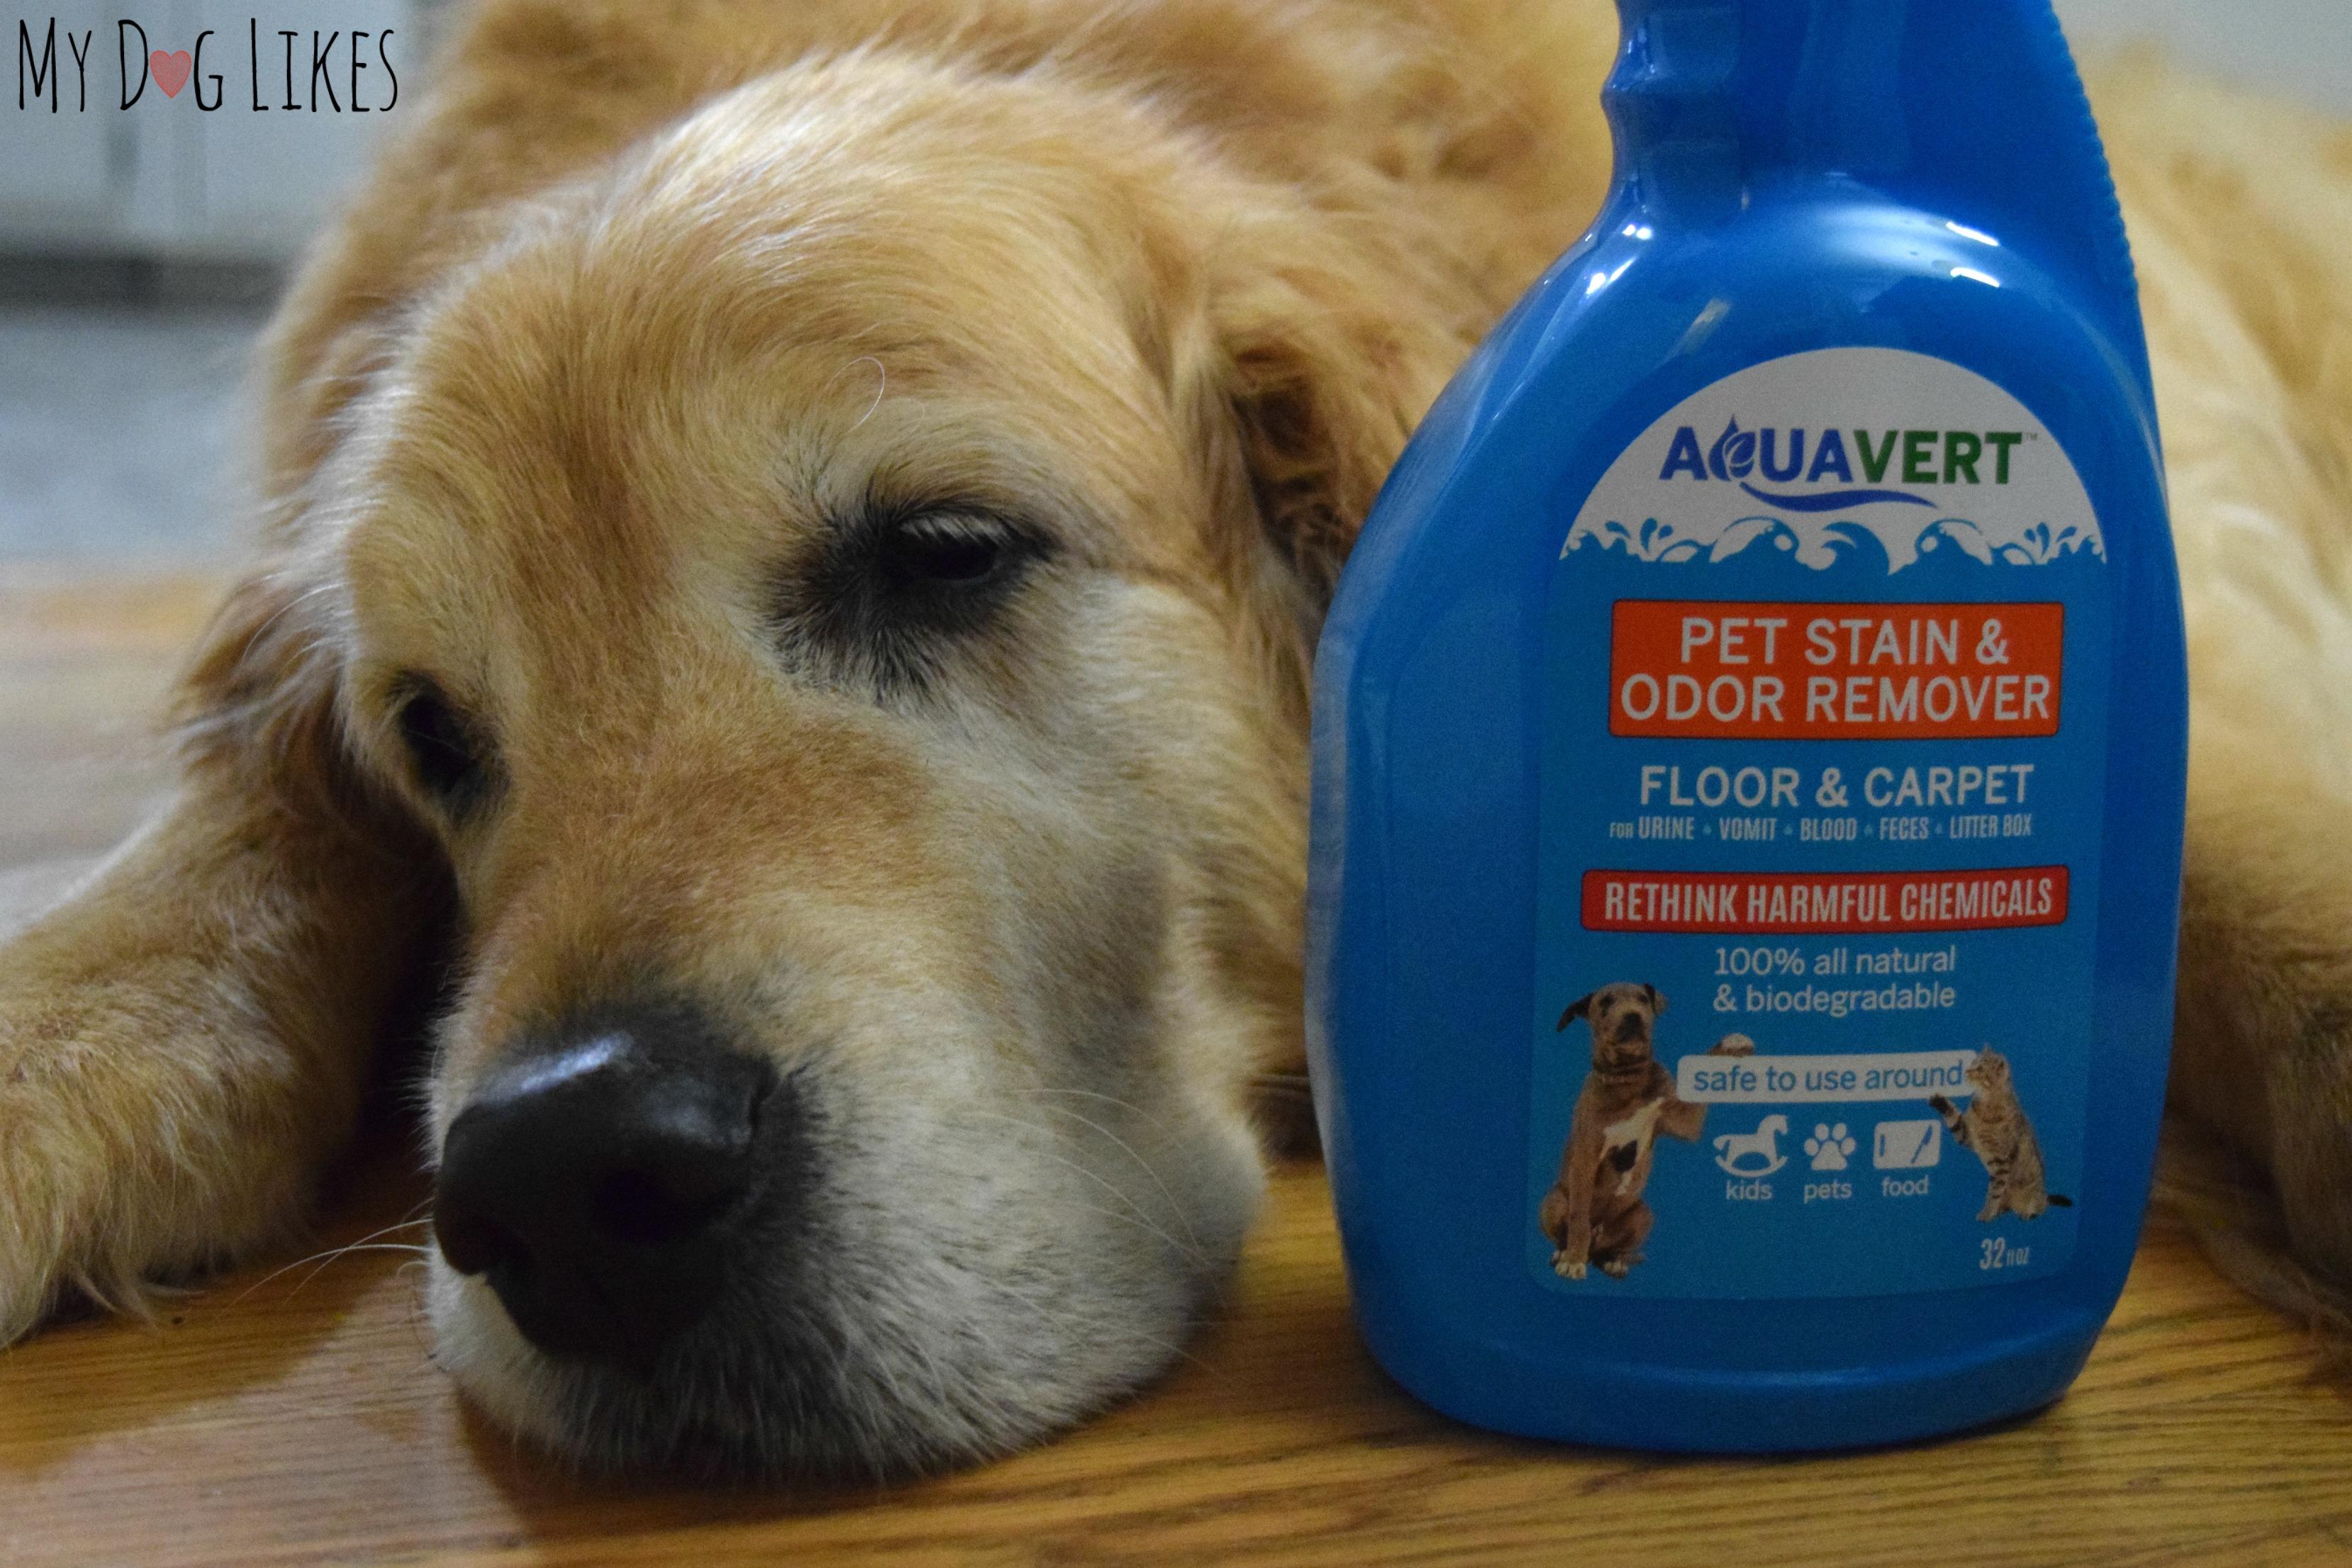 Clean Dog Vomit Sn Out Of Carpet Carpet Vidalondon